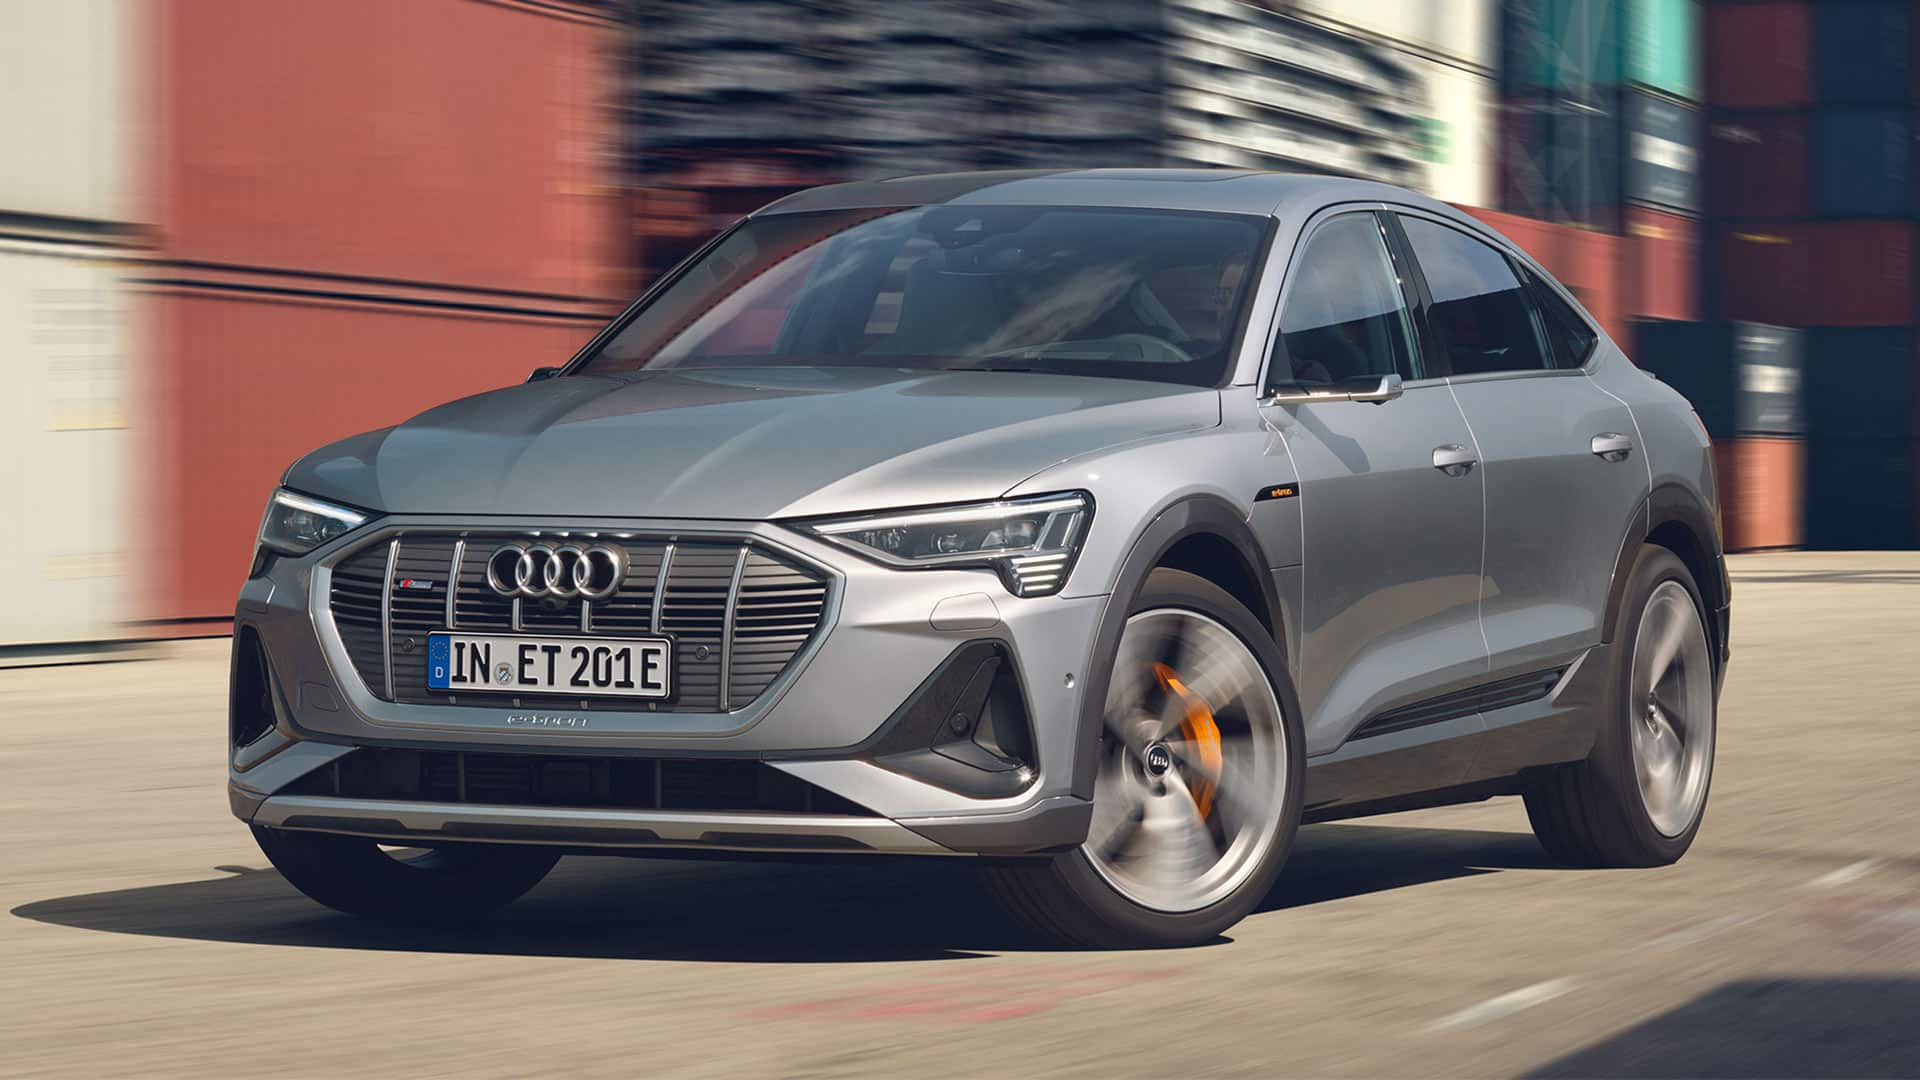 Moc Audi e-tron Sportback